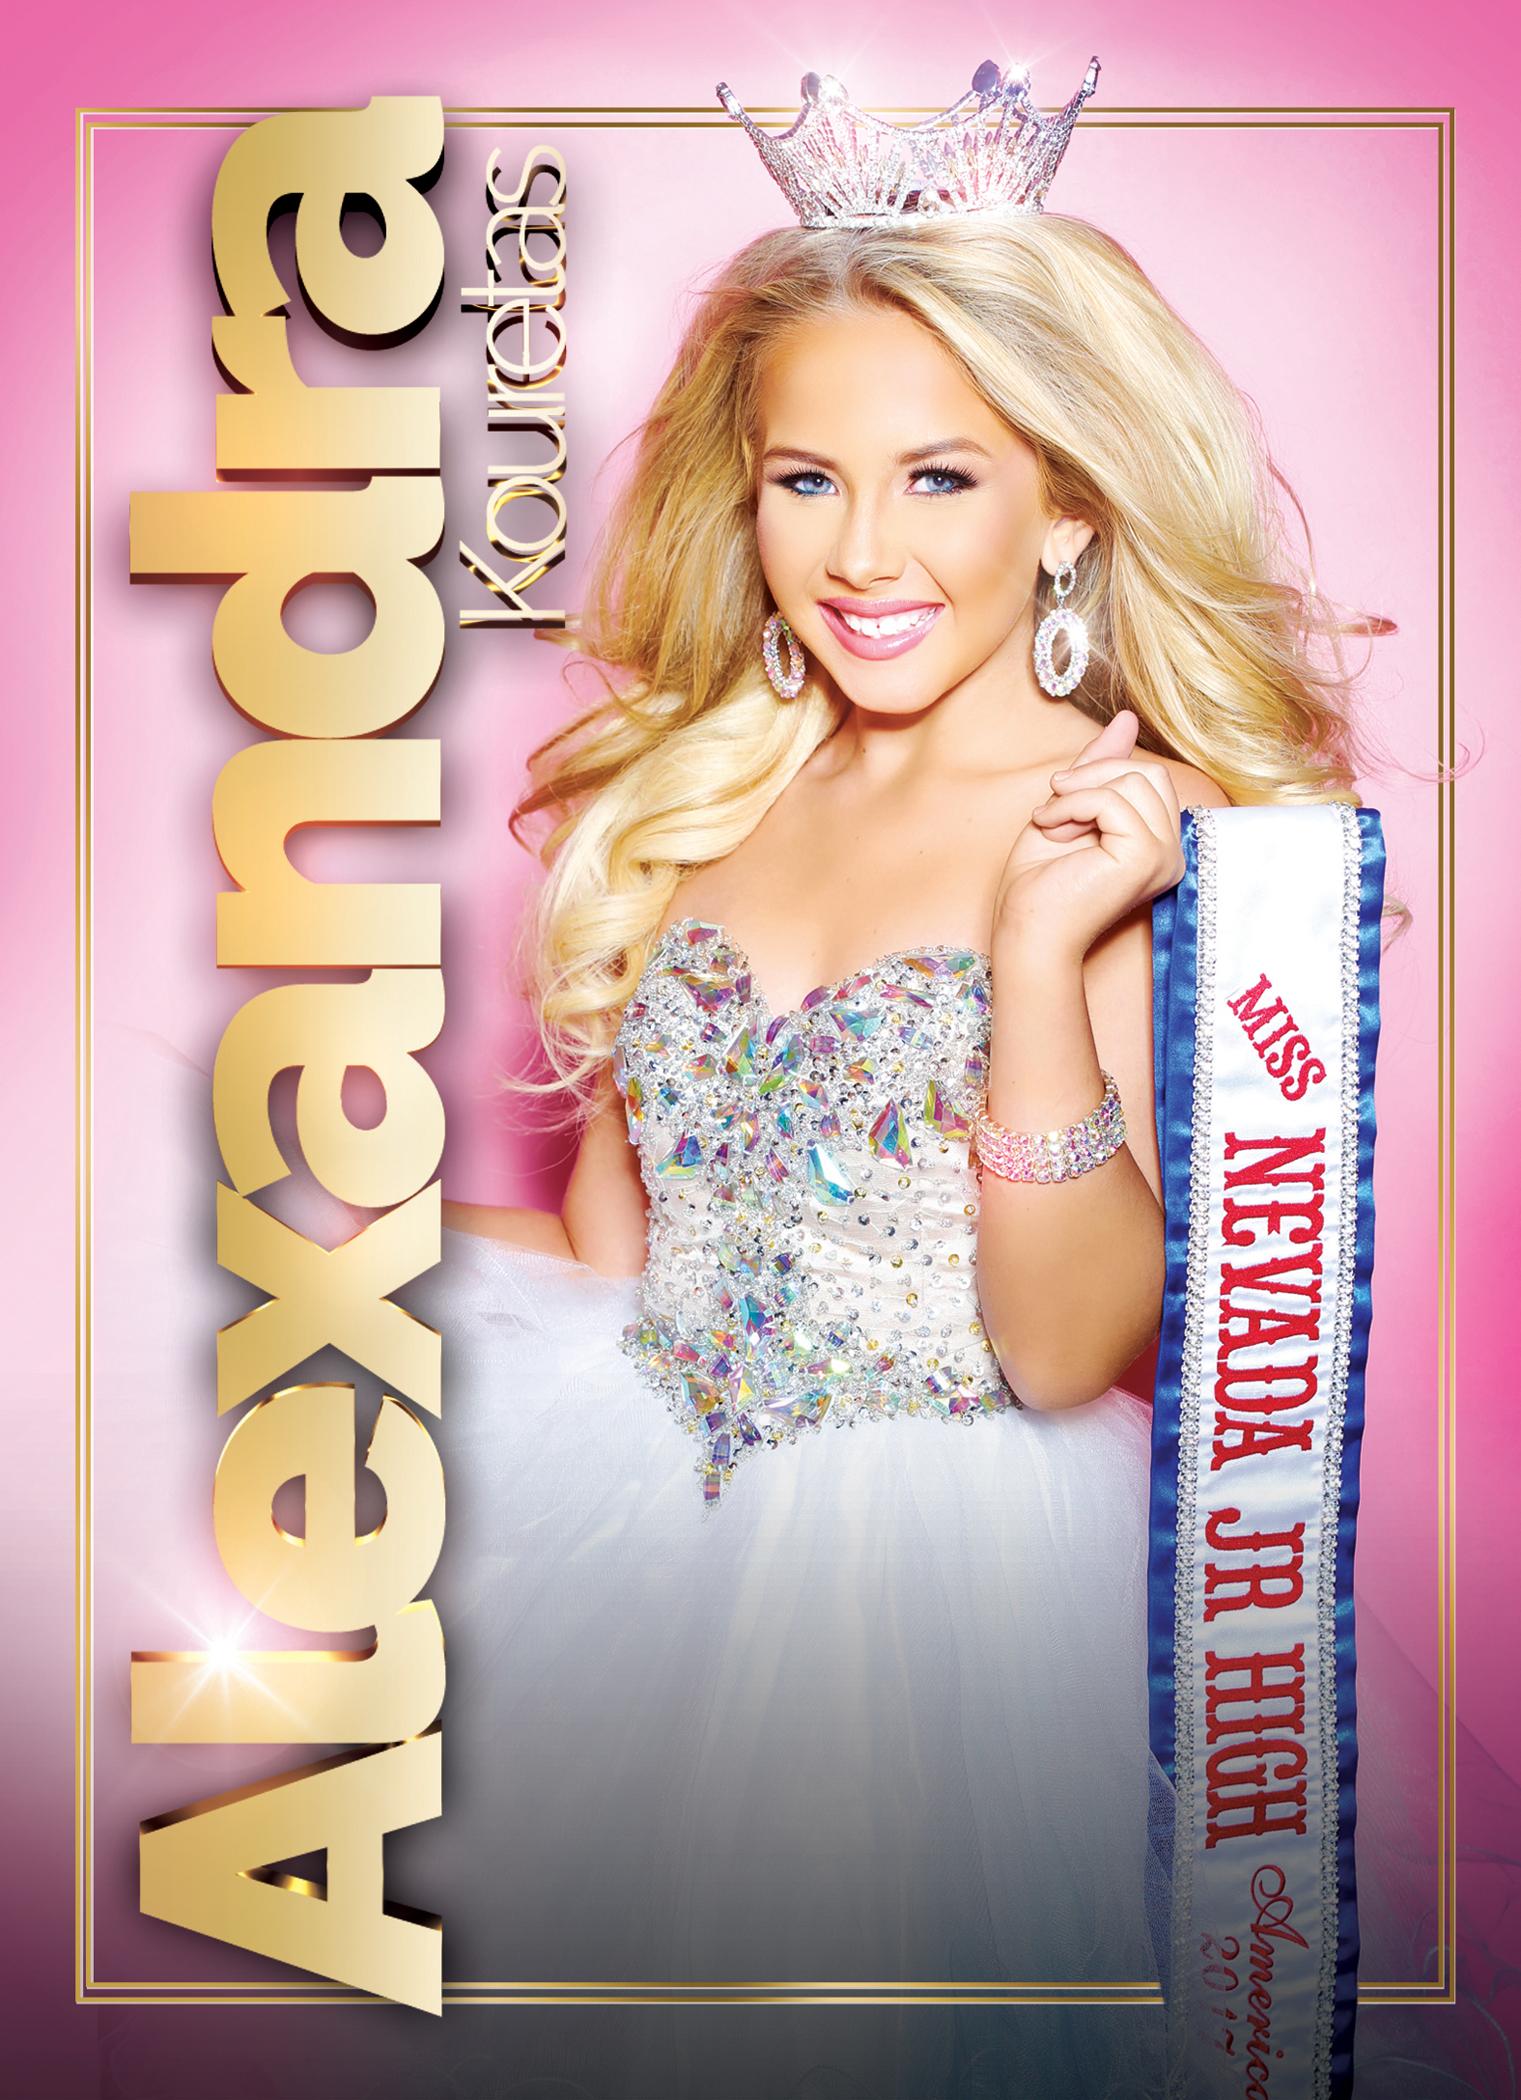 Kouretas, Amanda 5 X 7 Promo Card FRONT.